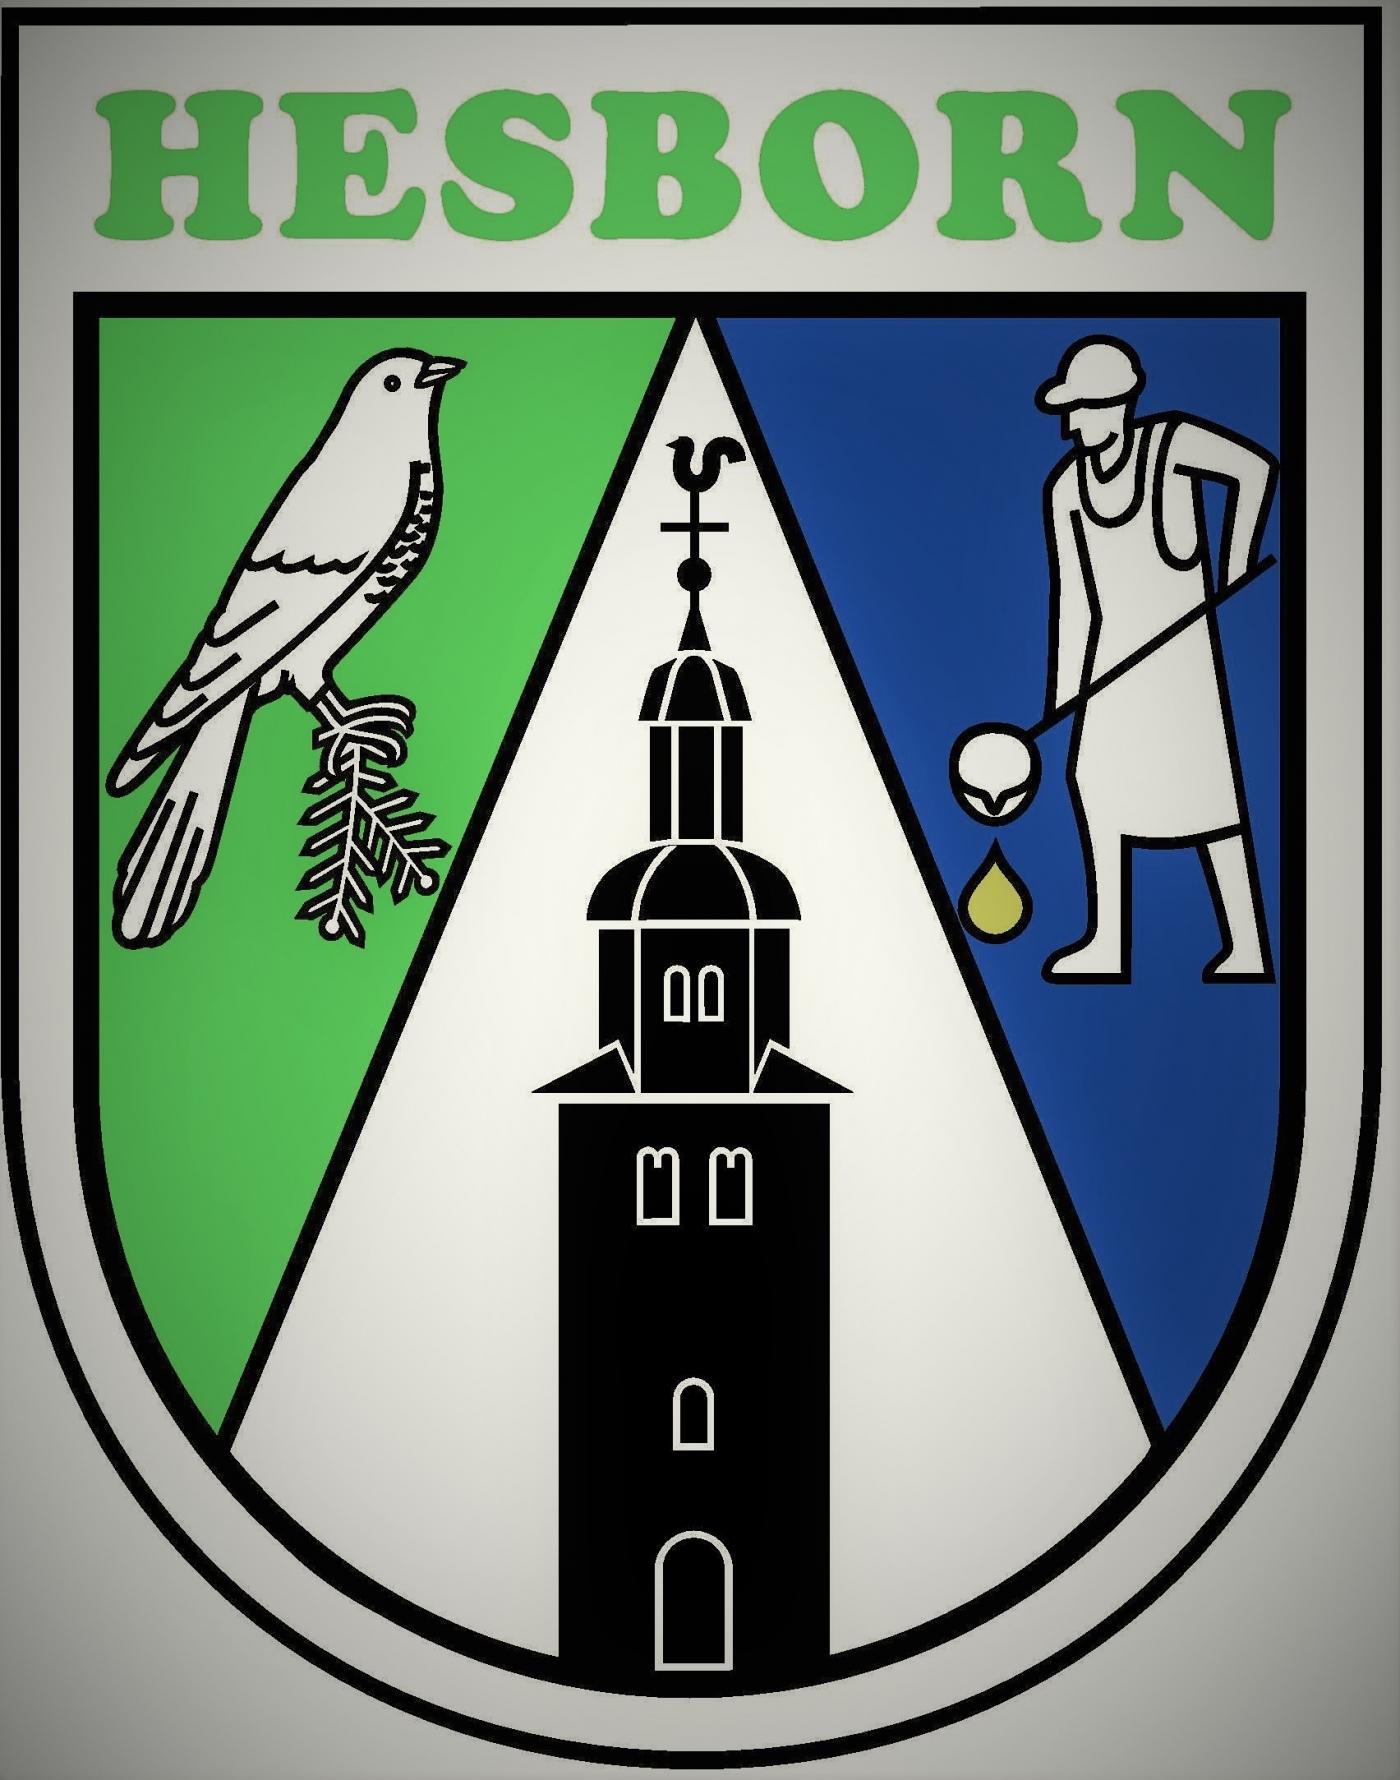 Hesborn